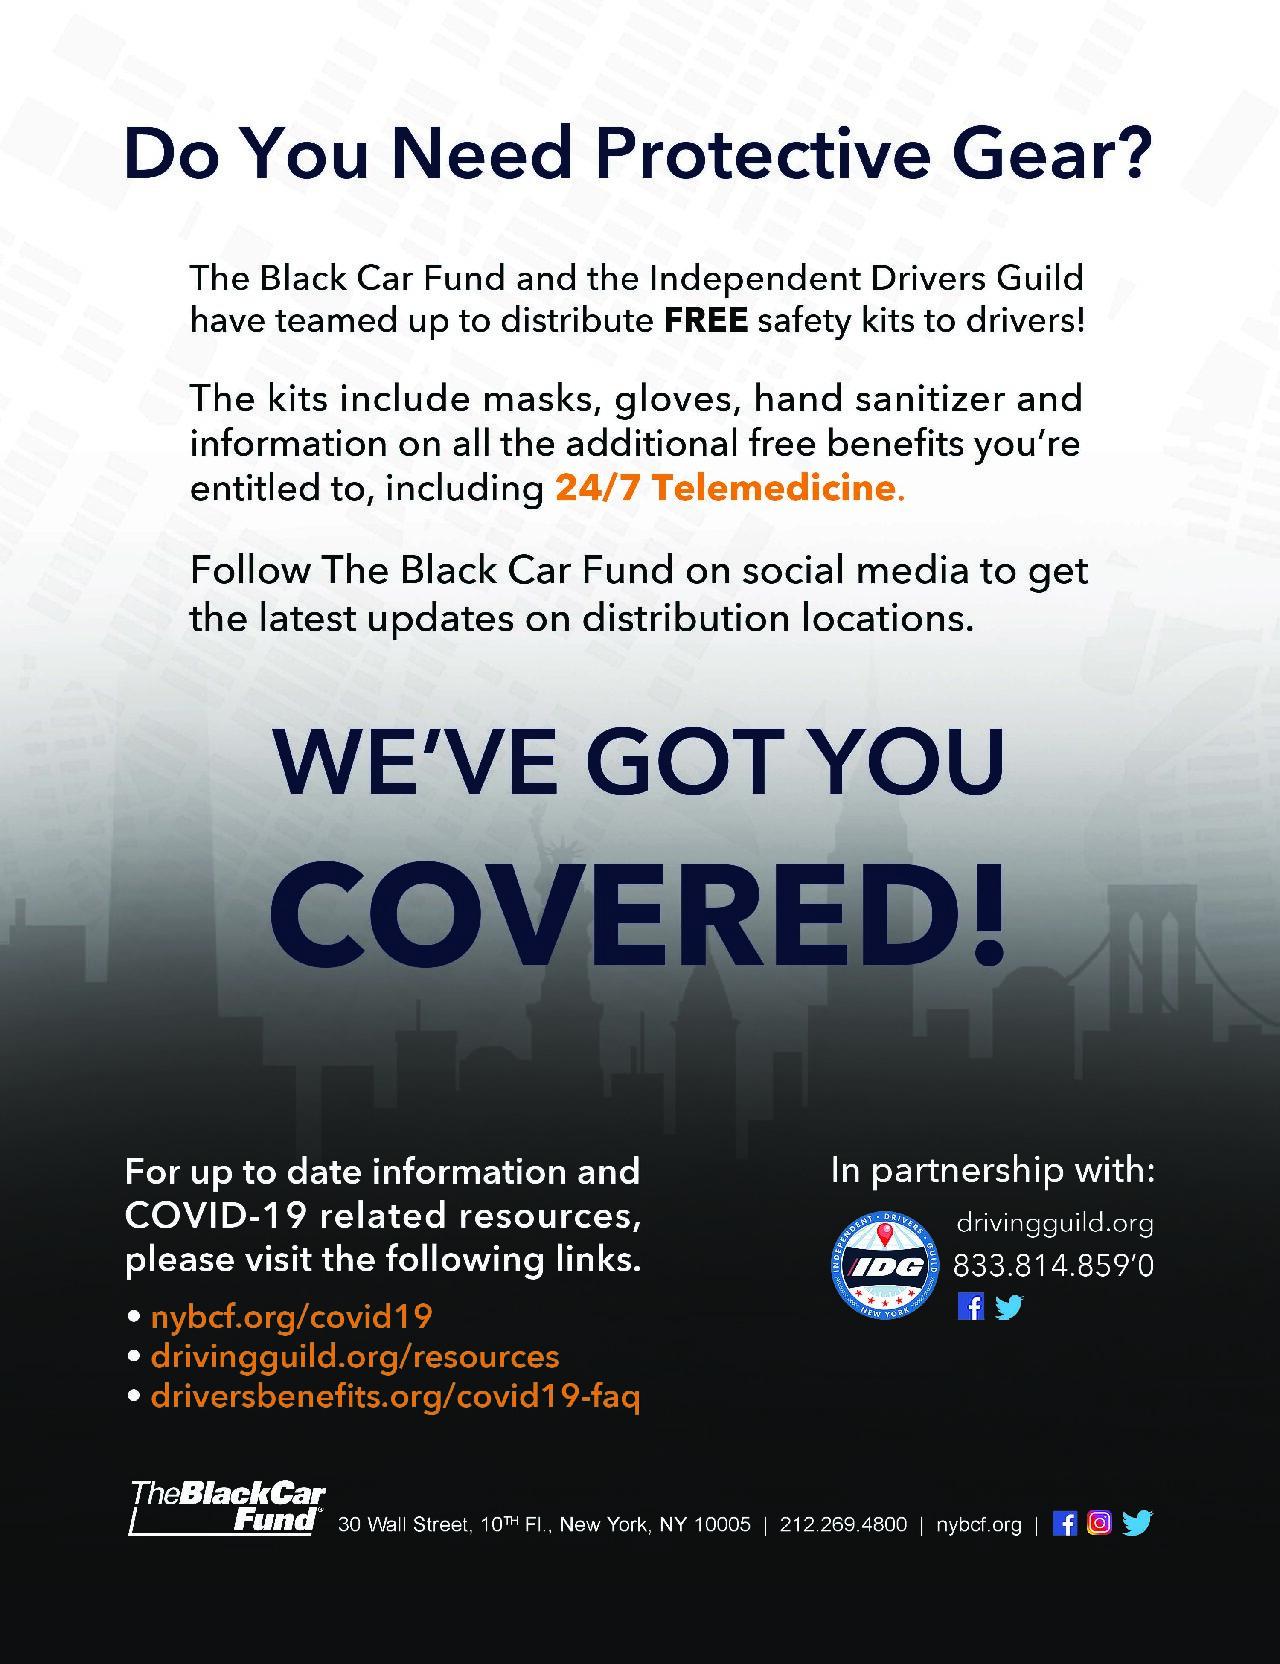 BLACK_CAR_FUND_PROTECTIVE_GEAR-pdf